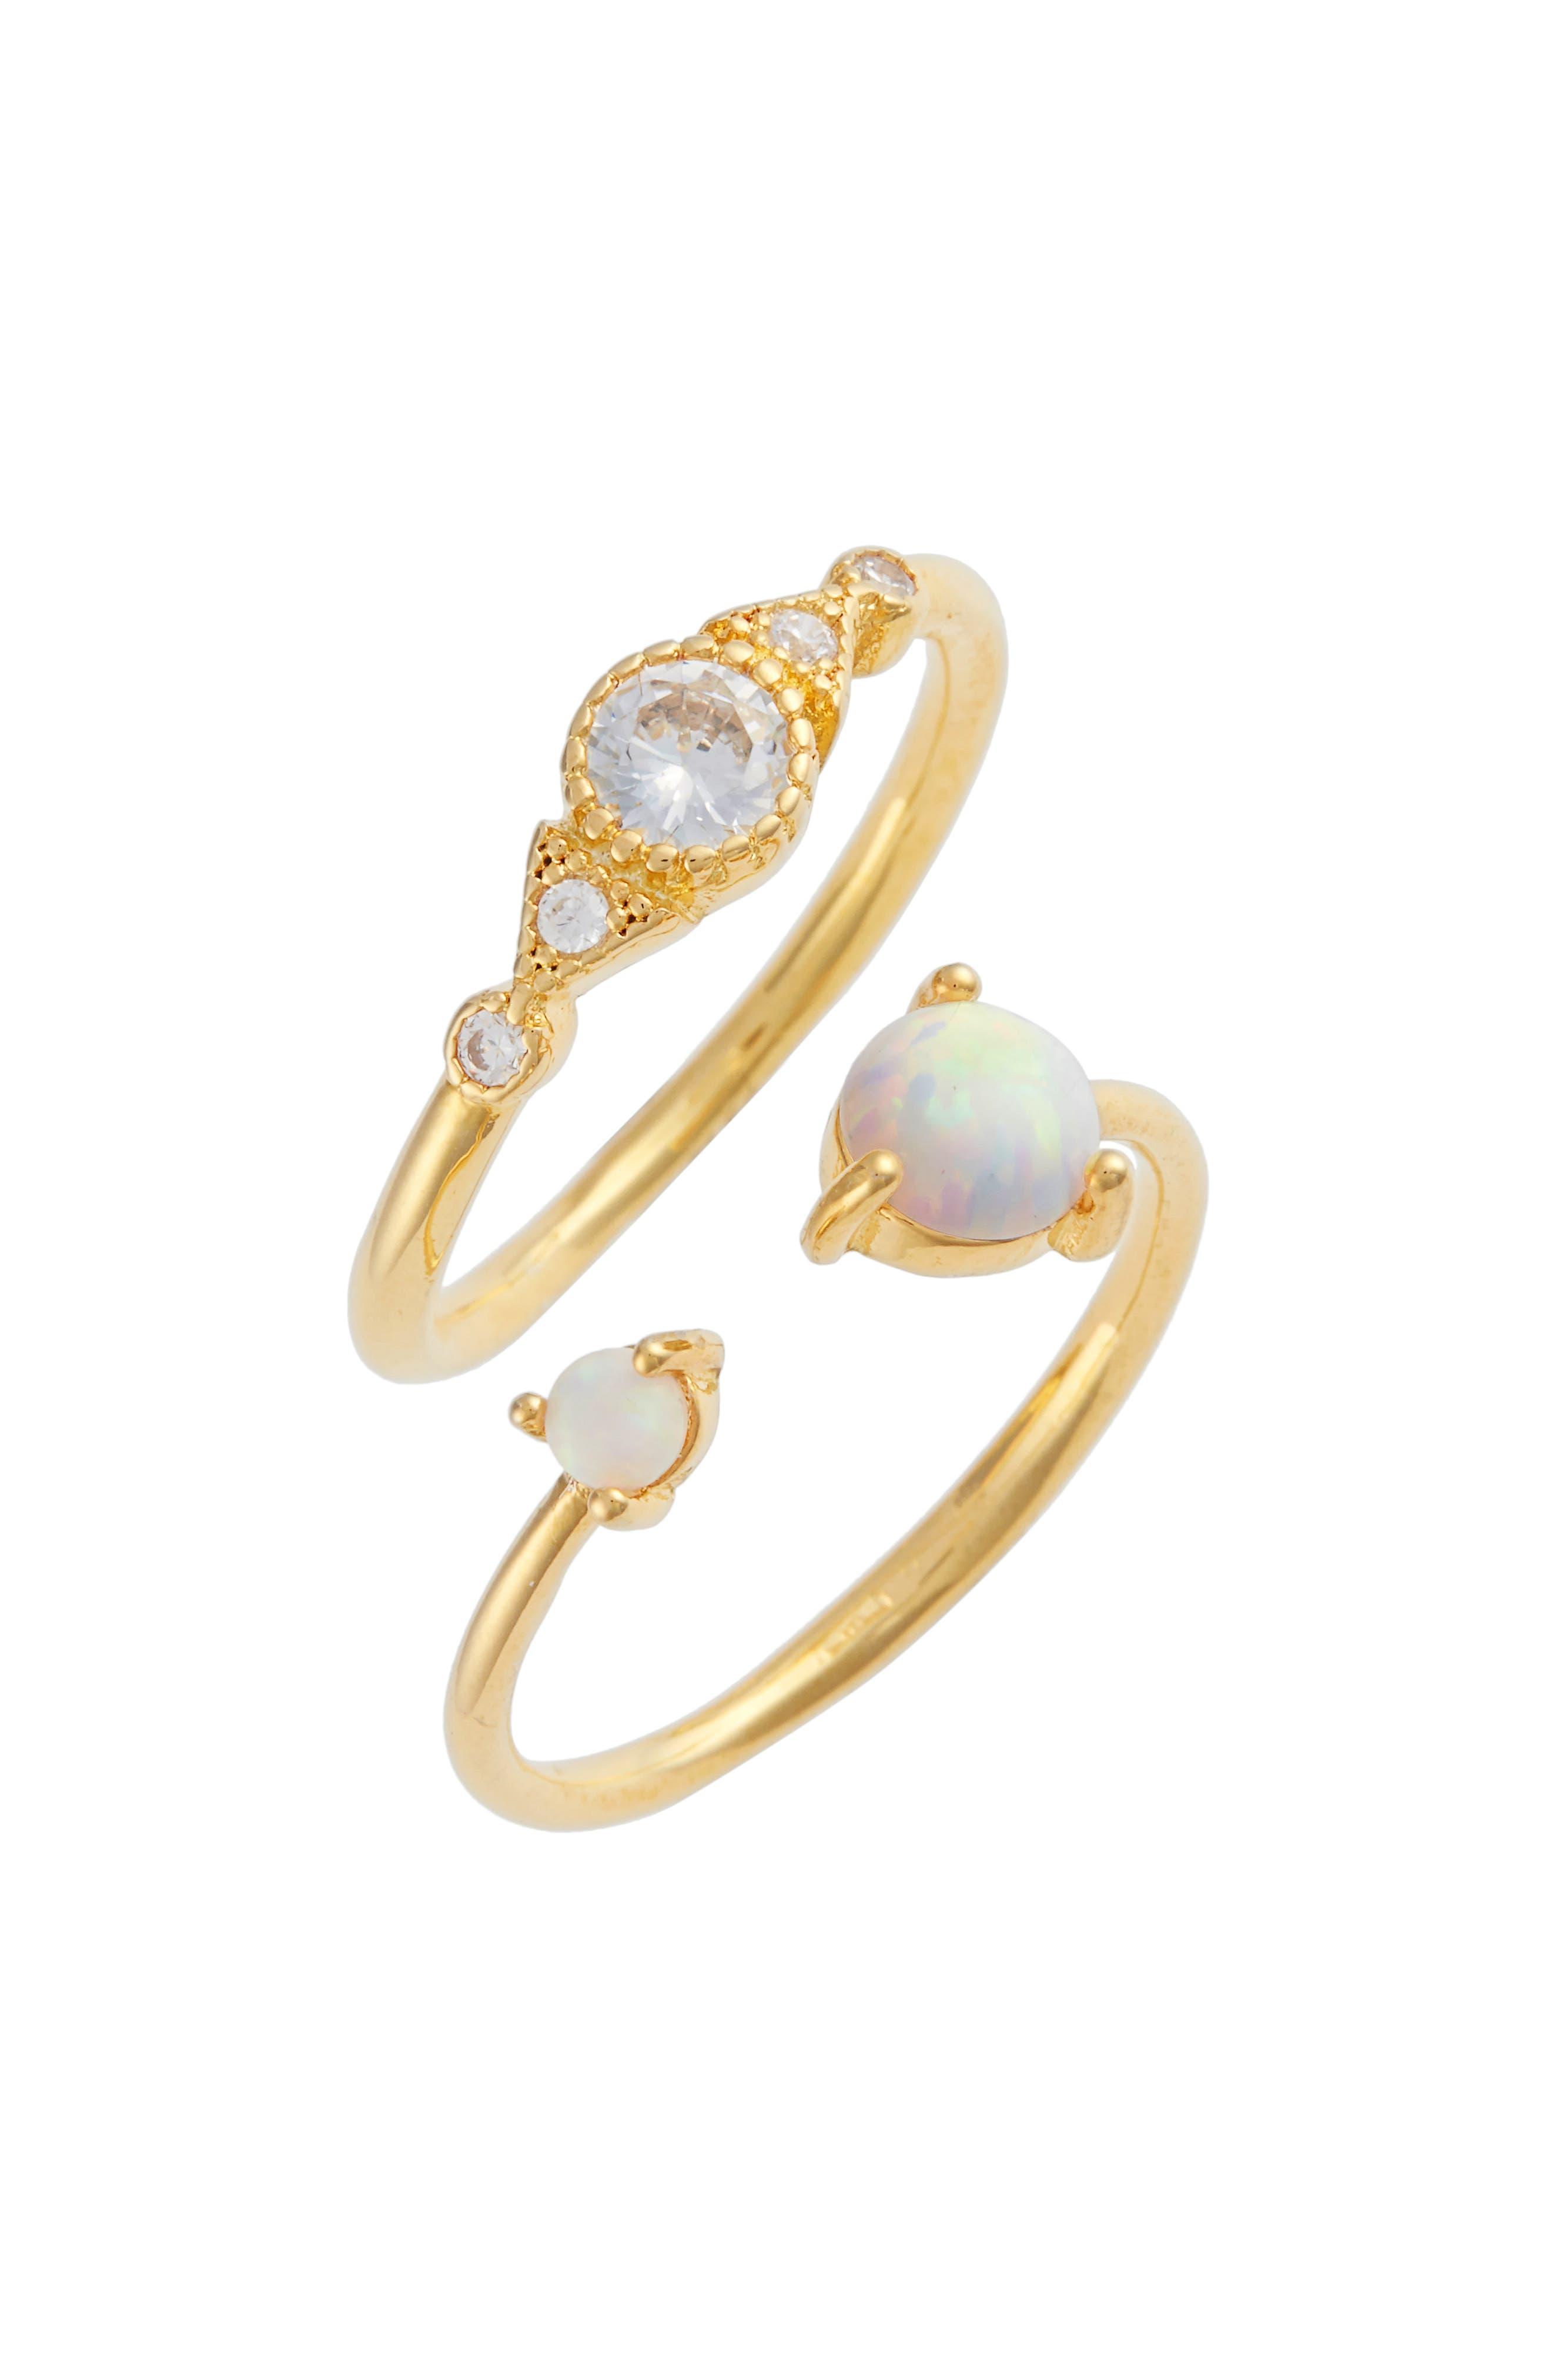 Lorah Set of 2 Fire Opal & Crystal Rings,                             Main thumbnail 1, color,                             Gold